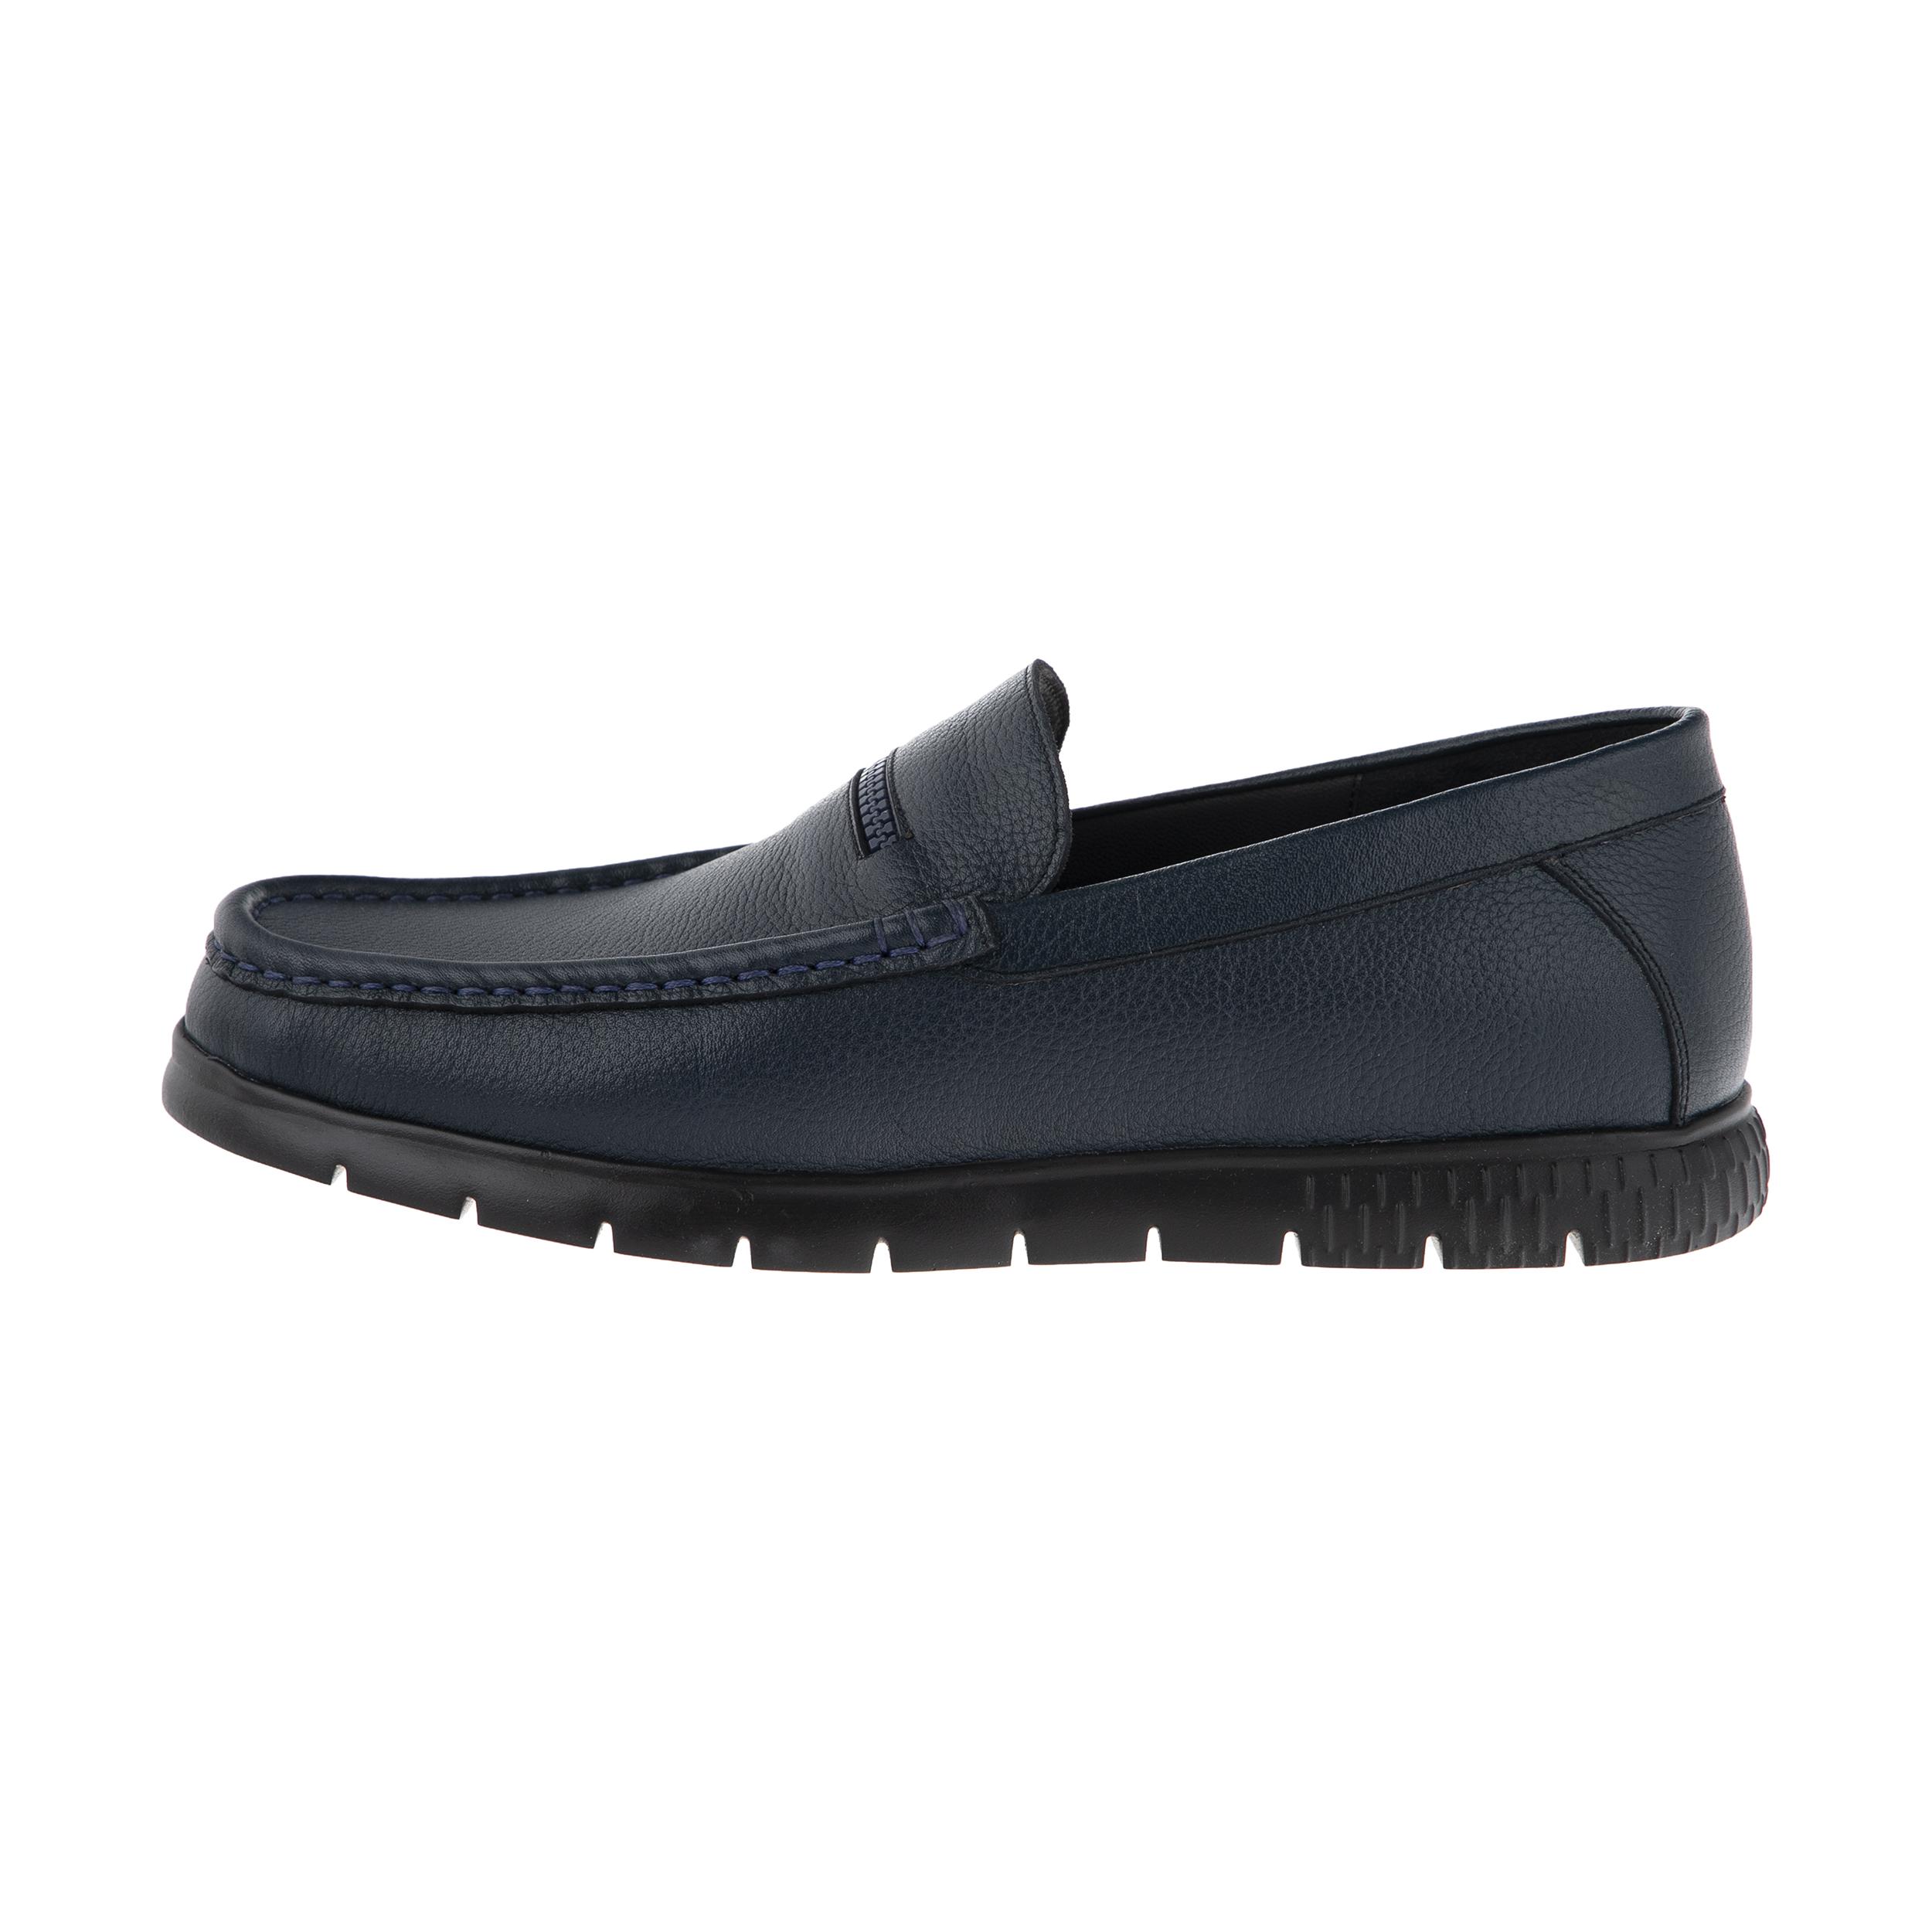 کفش روزمره مردانه برتونیکس مدل C16-16